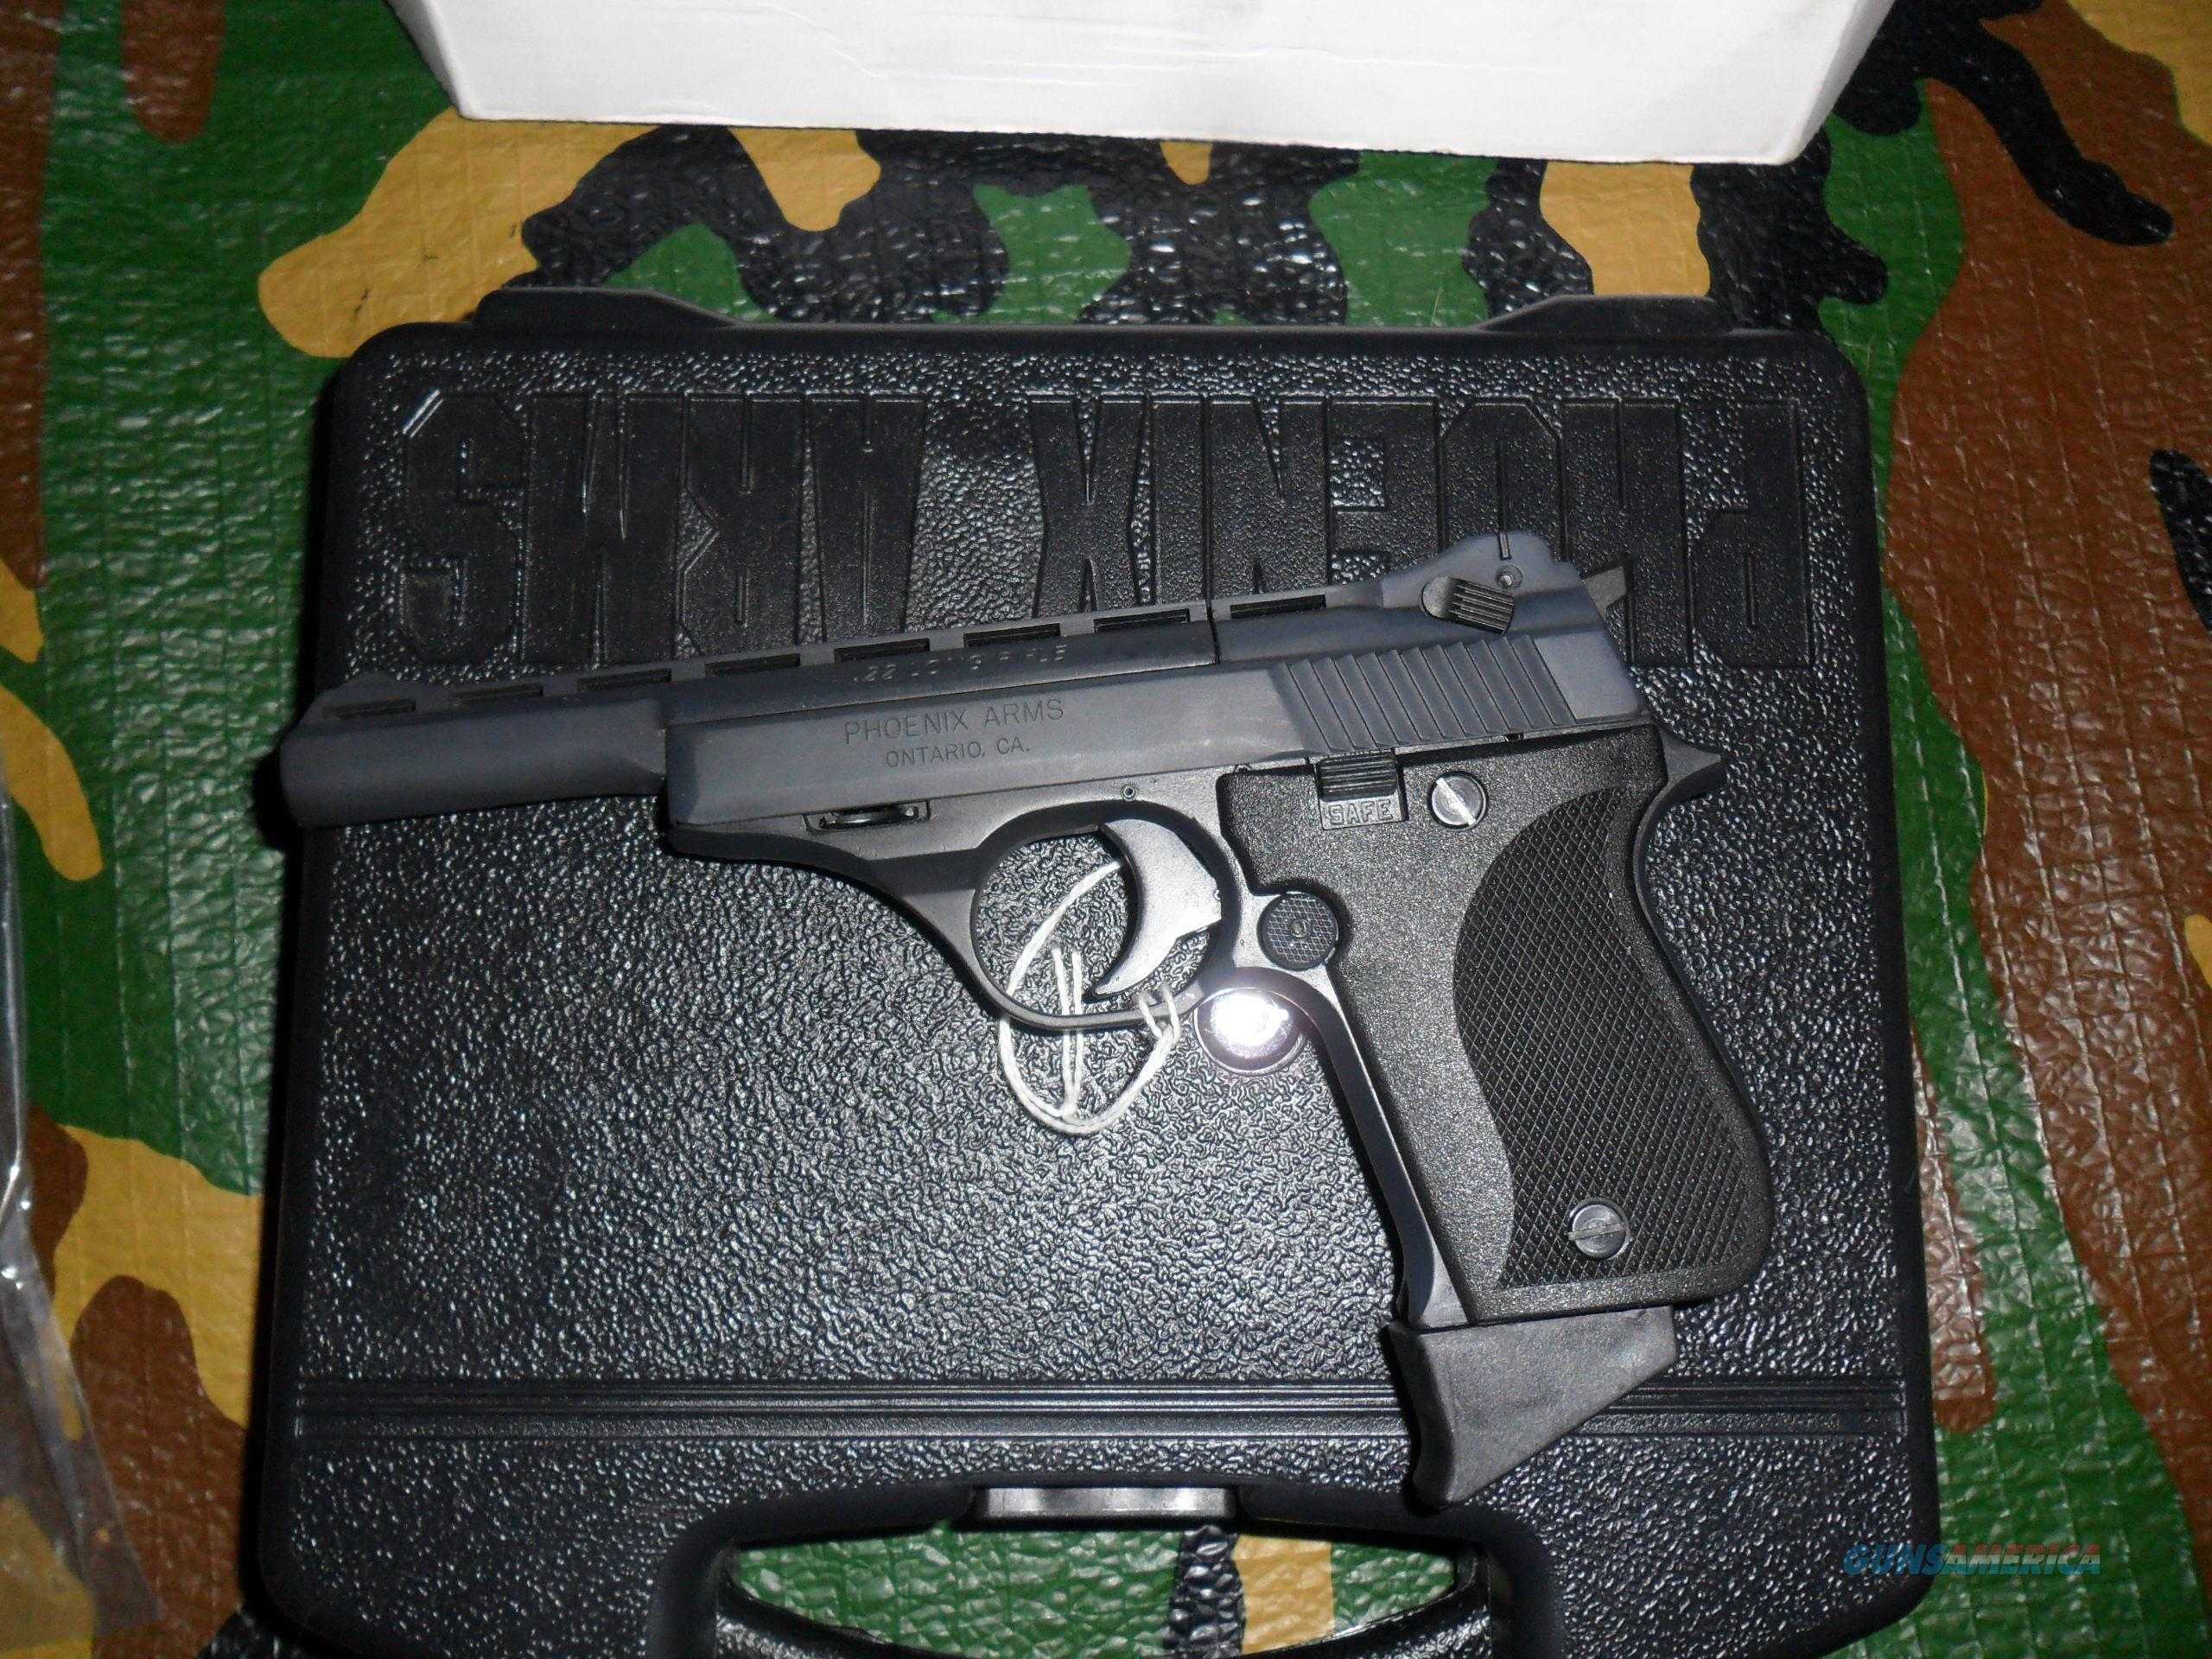 PHOENIX ARMS HP22A DELUXE RANGE KIT .22LR   Guns > Pistols > Phoenix Pistols